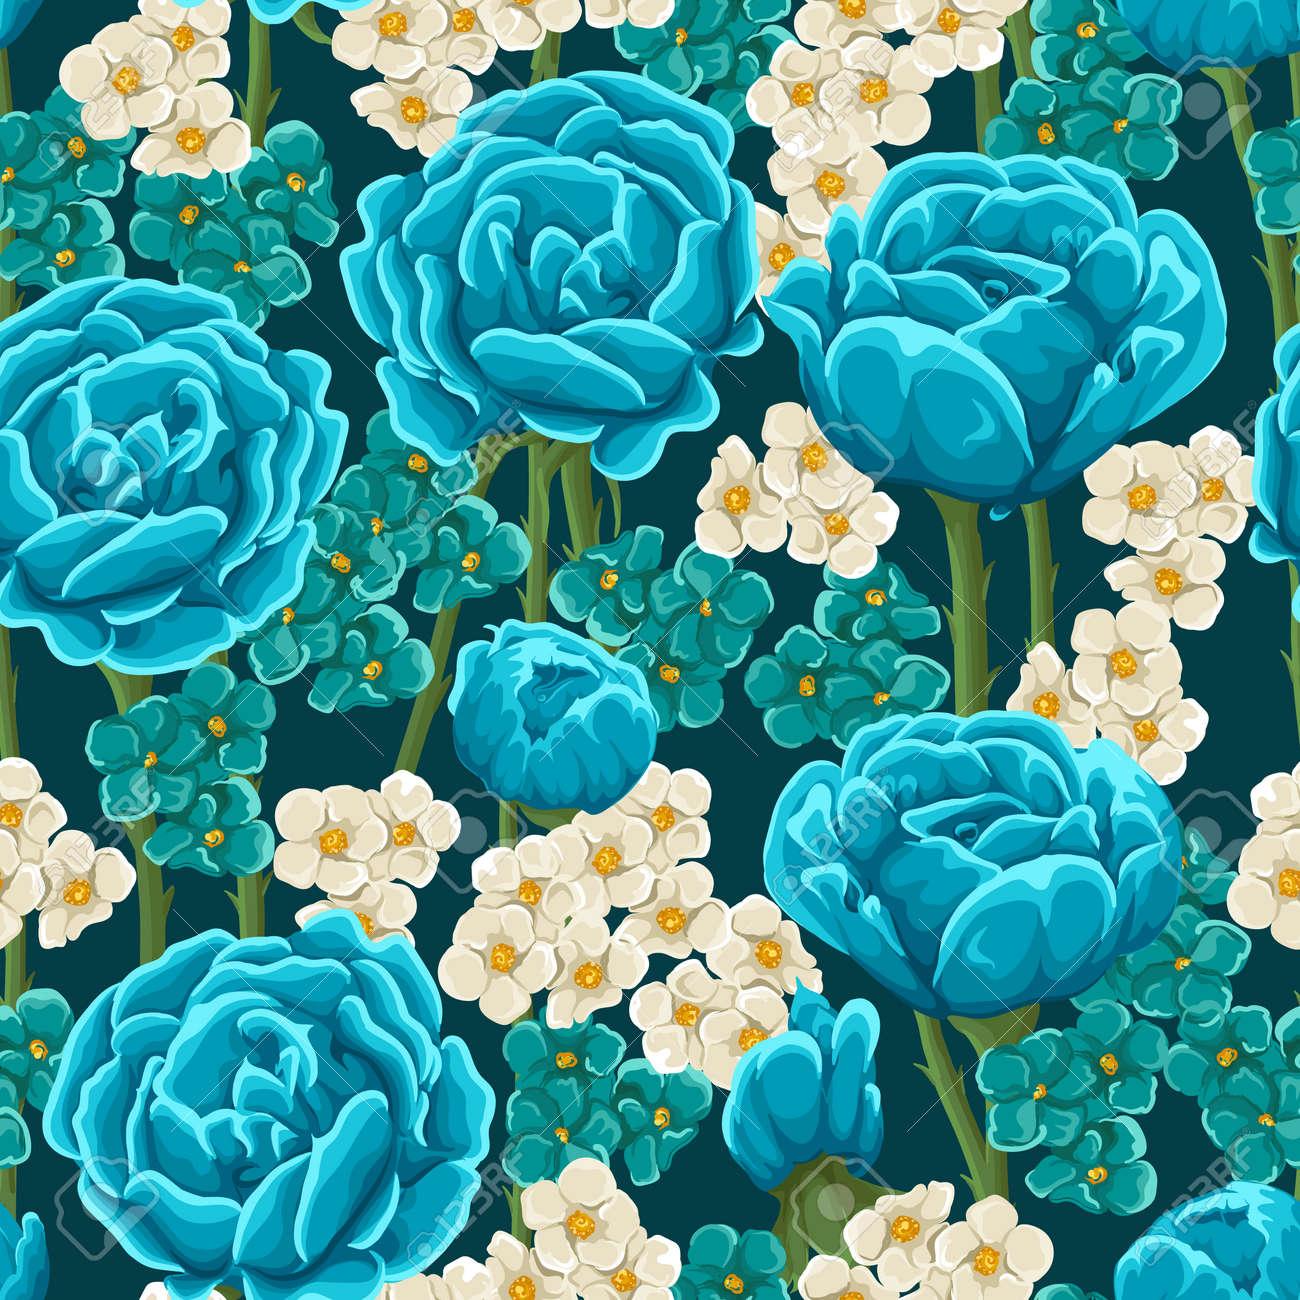 Modelo Inconsútil Floral Con Rosas Azules Y Pequeñas Flores De Color